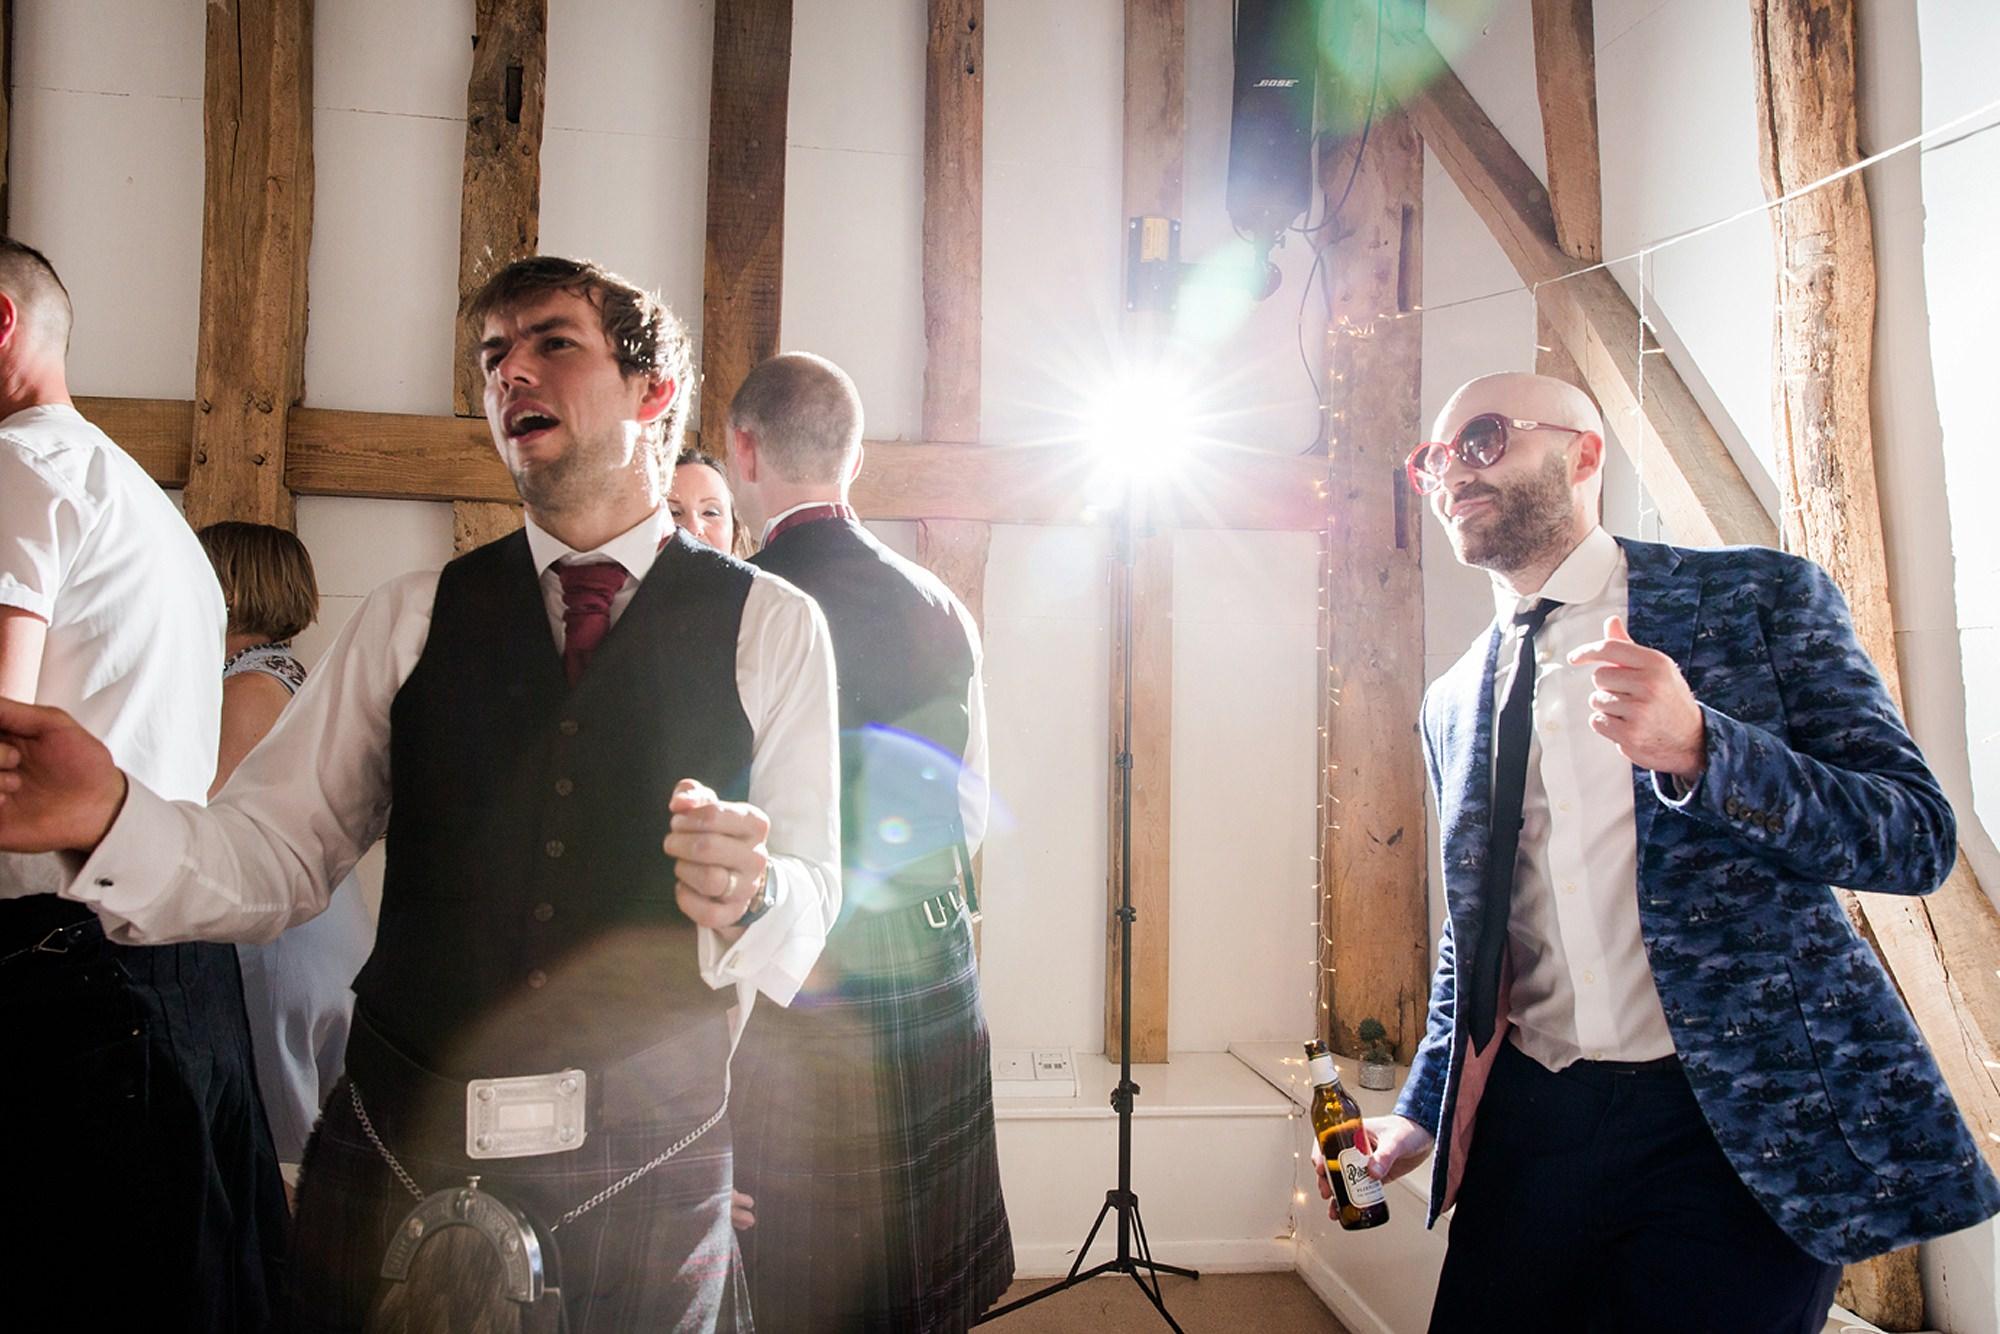 Outdoor humanist wedding photography fun guests dancing